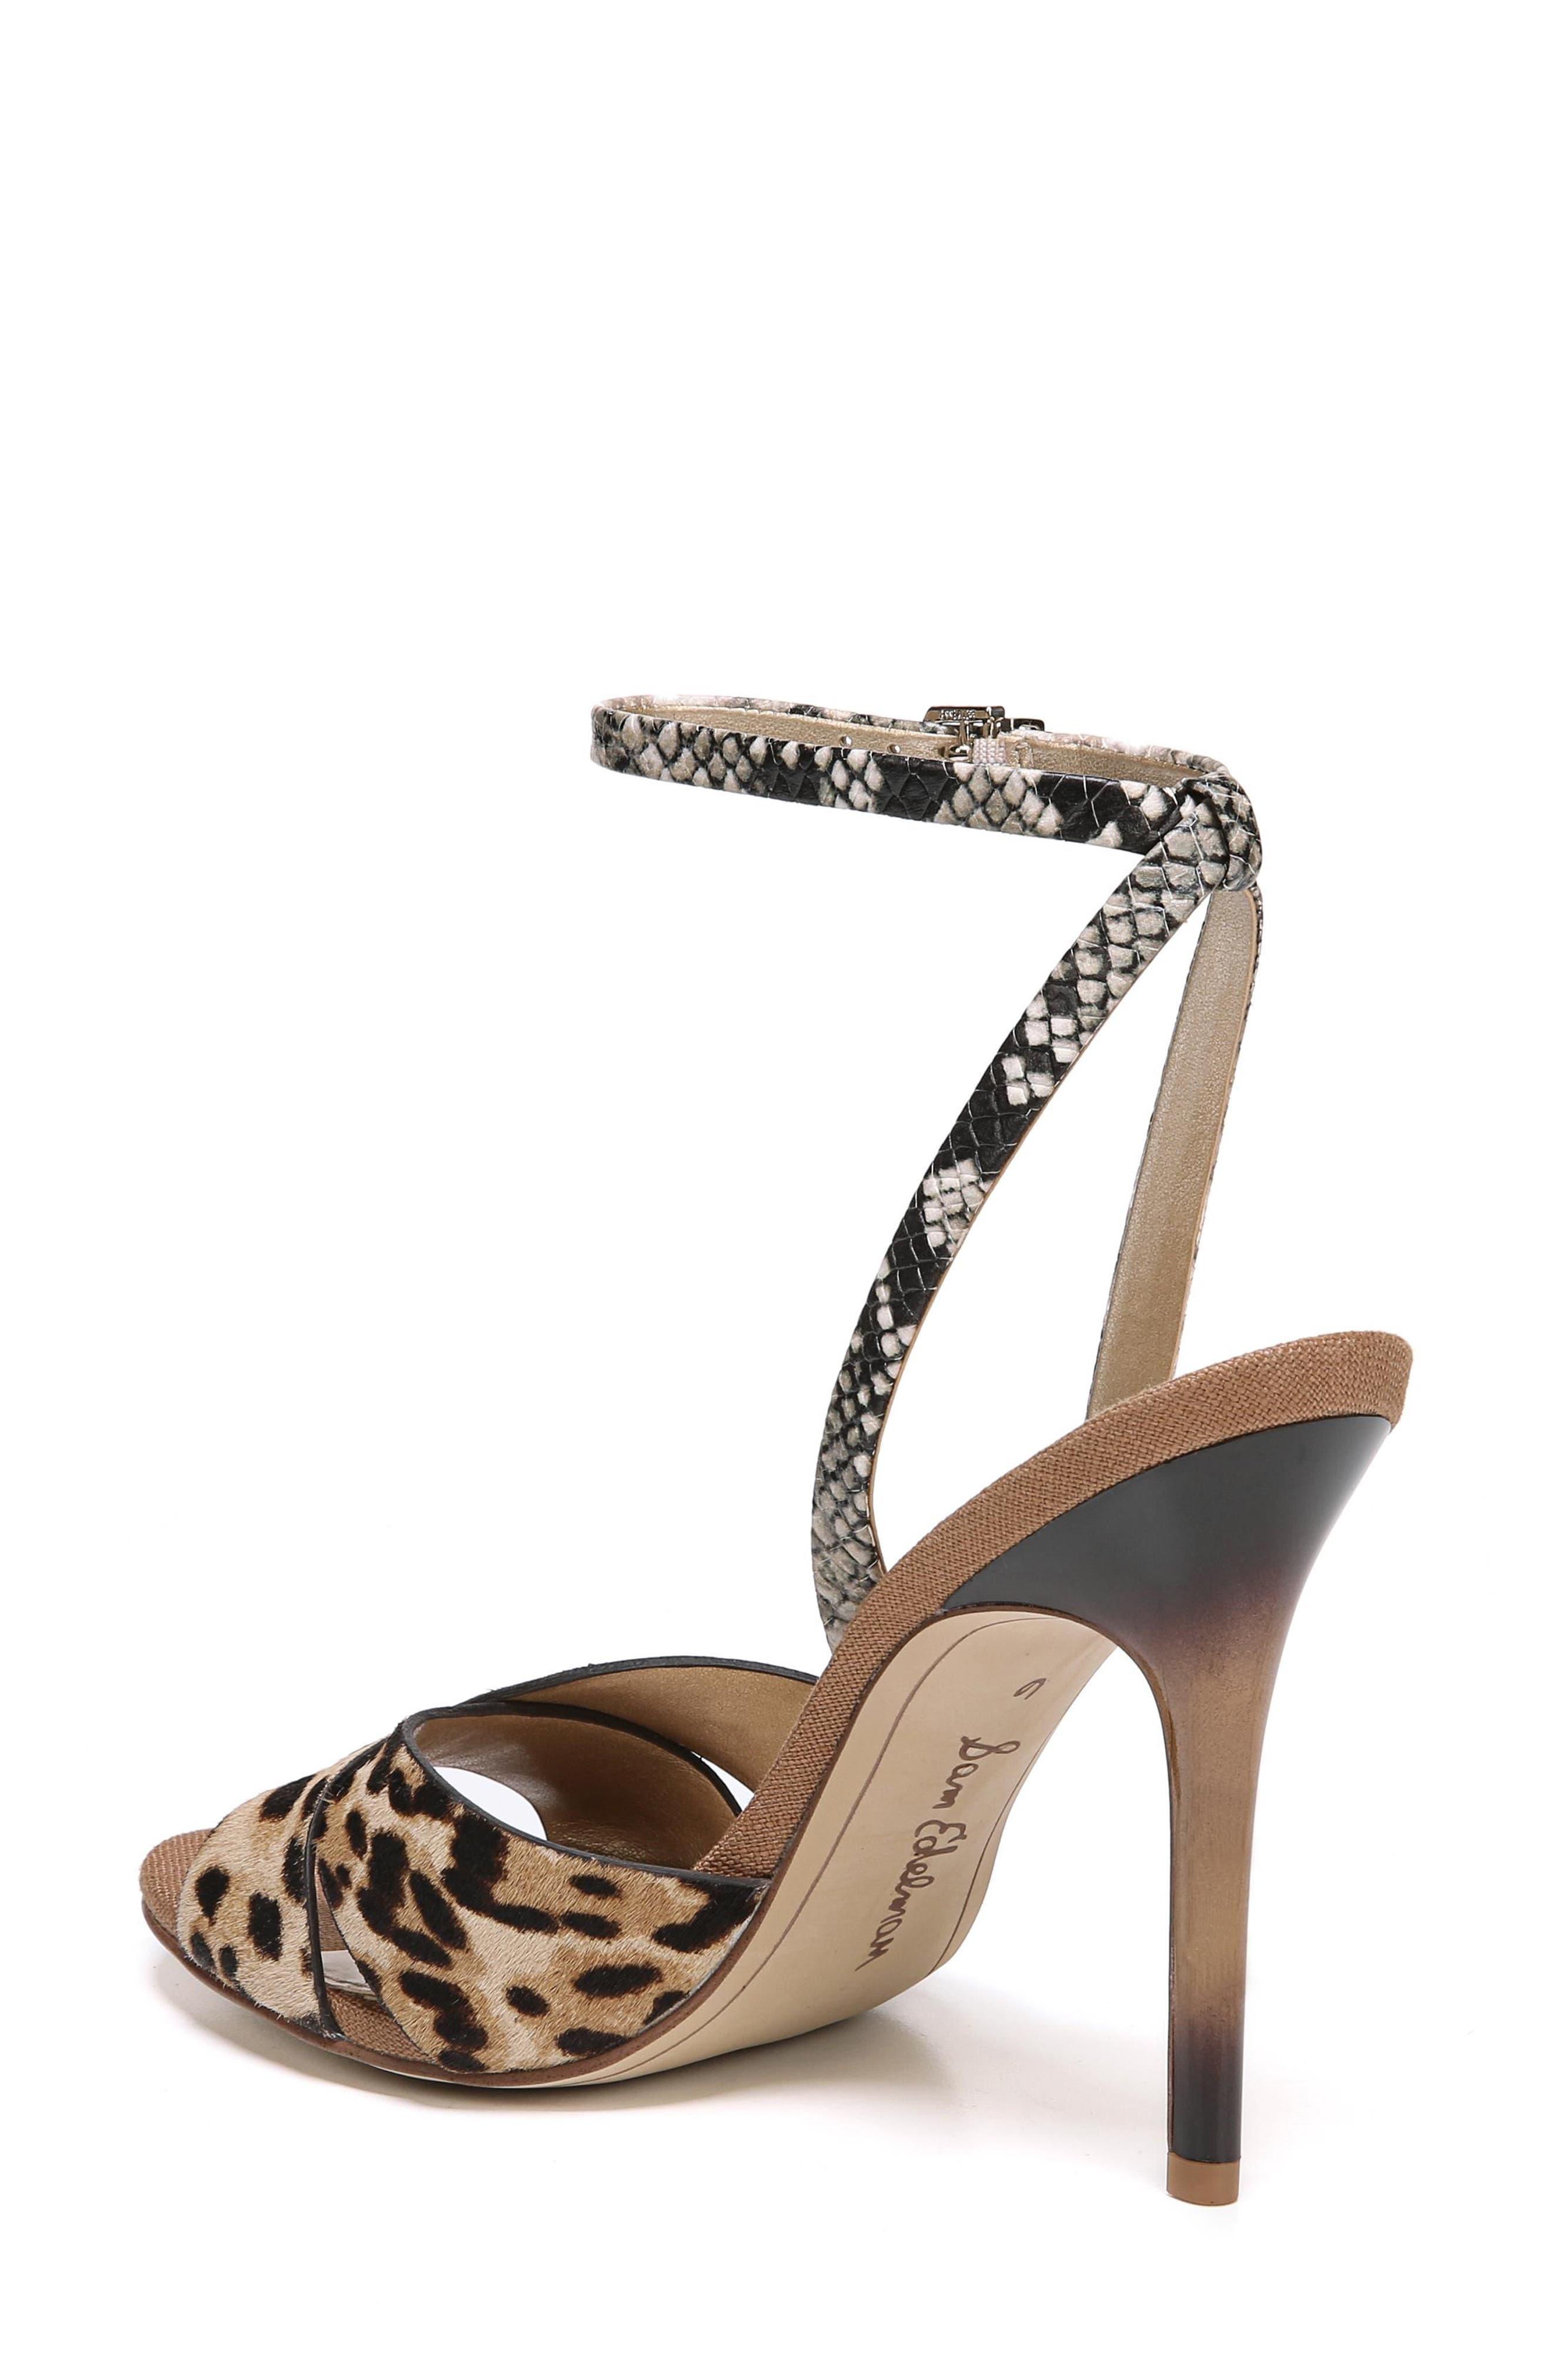 Aly Ankle Strap Sandal,                             Alternate thumbnail 2, color,                             Leopard Print Calf Hair